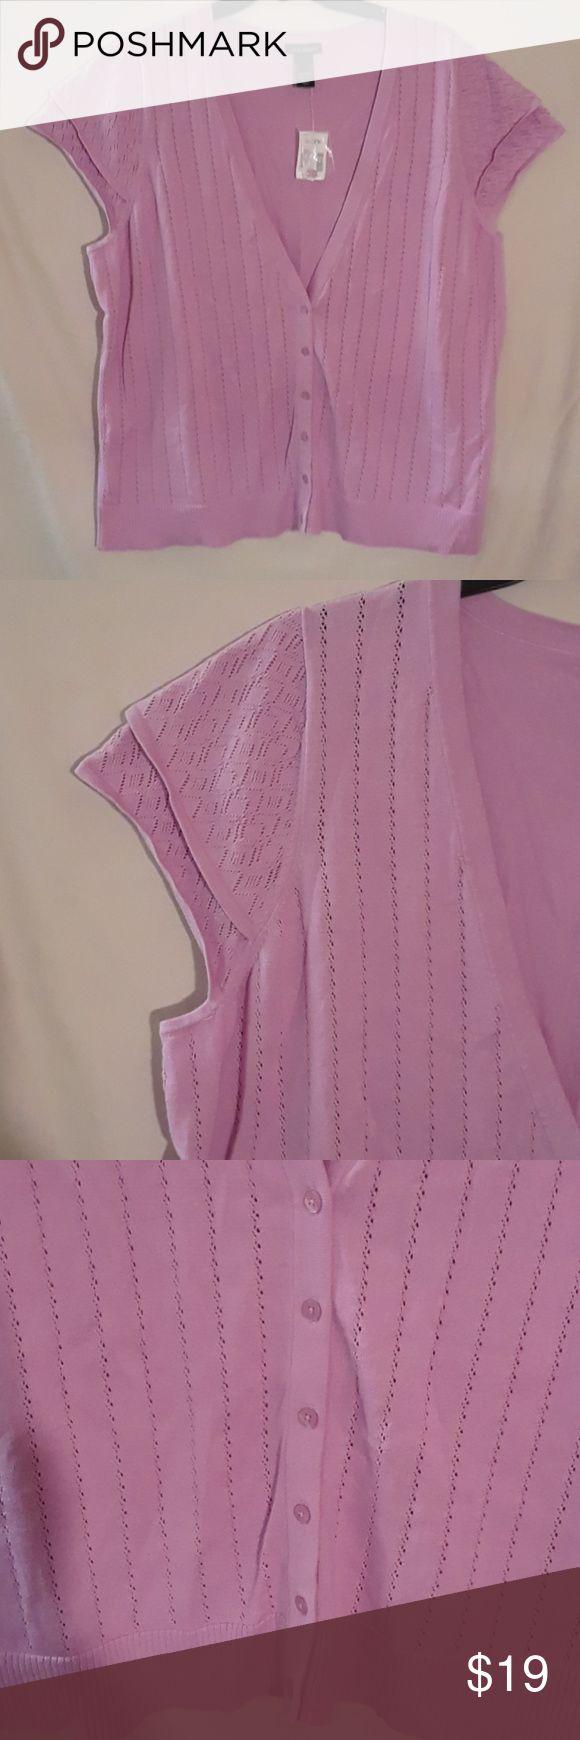 Short sleeve Cardigan Pink Short sleeve Cardigan Lane Bryant Sweaters Cardigans